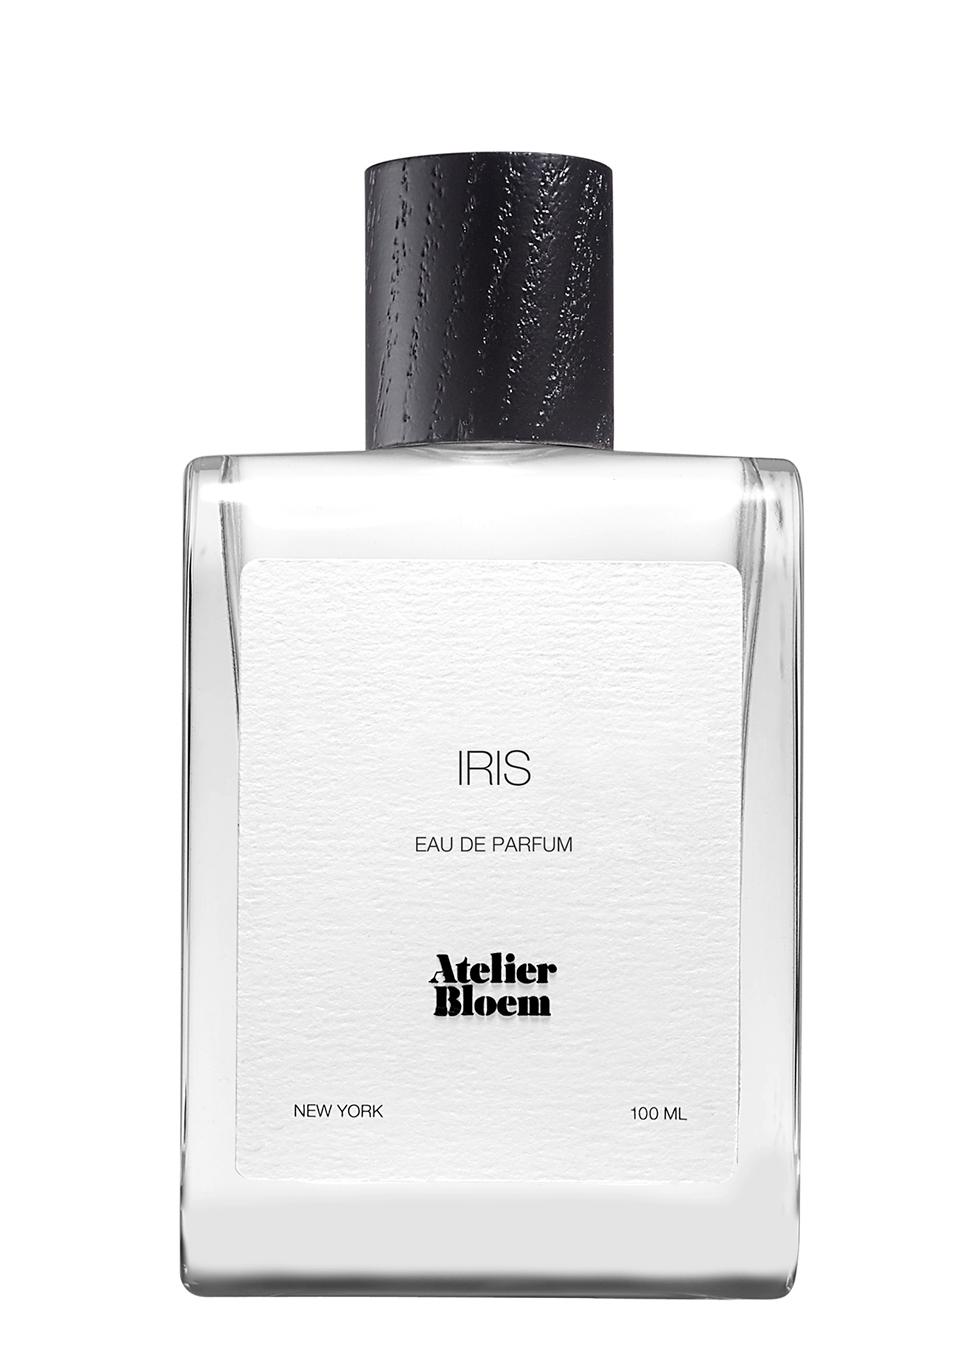 Iris Eau De Parfum 100ml - ATELIER BLOEM